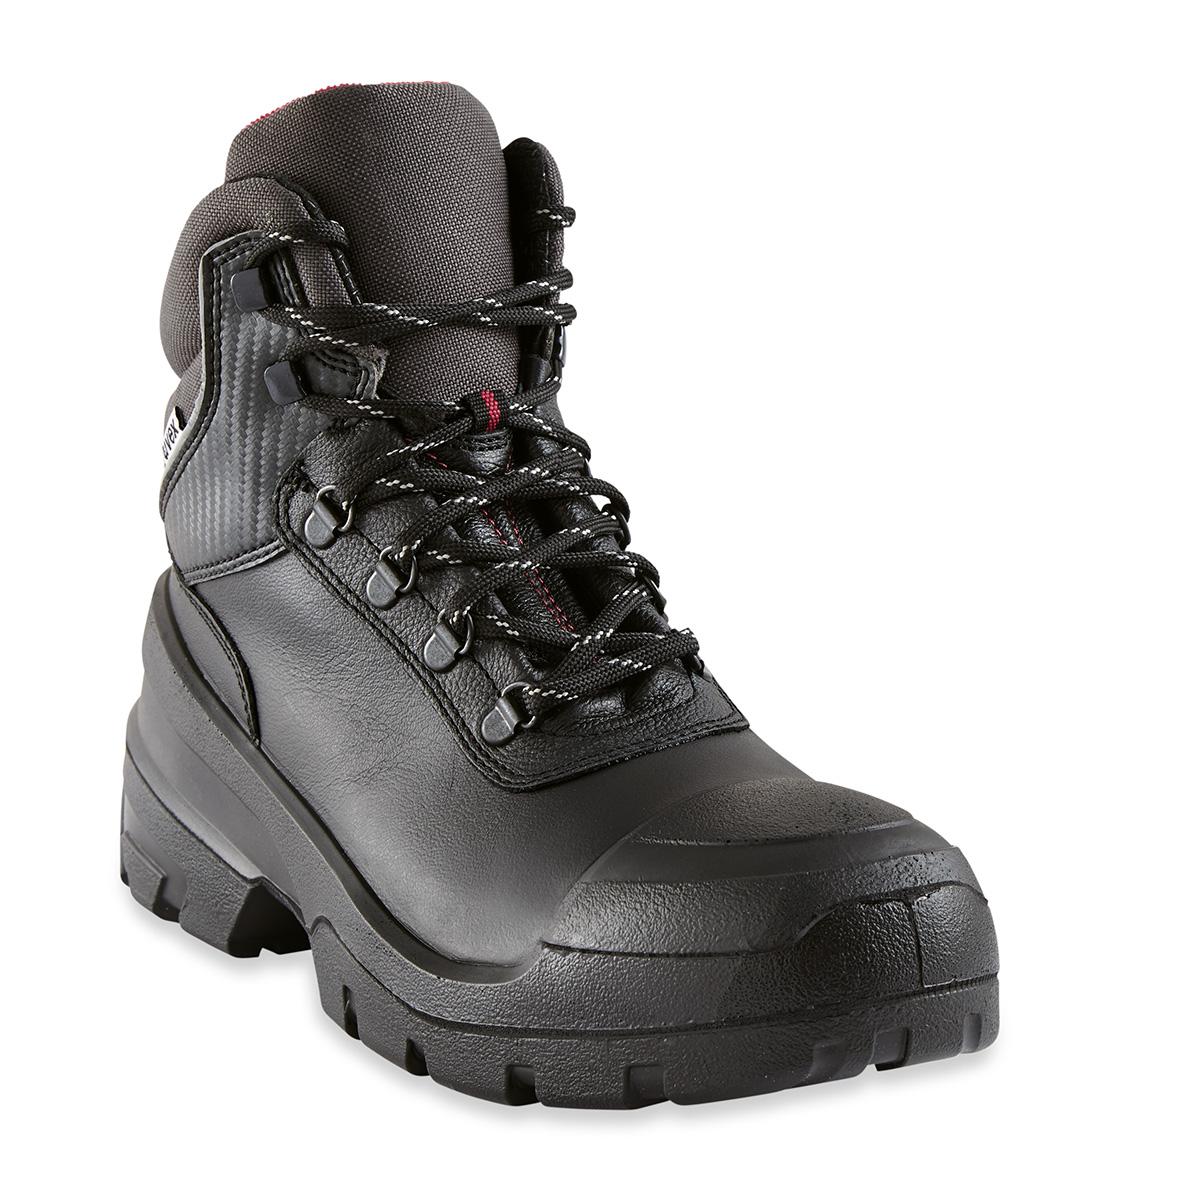 Quatro Pro Safety Boots | Hazchem